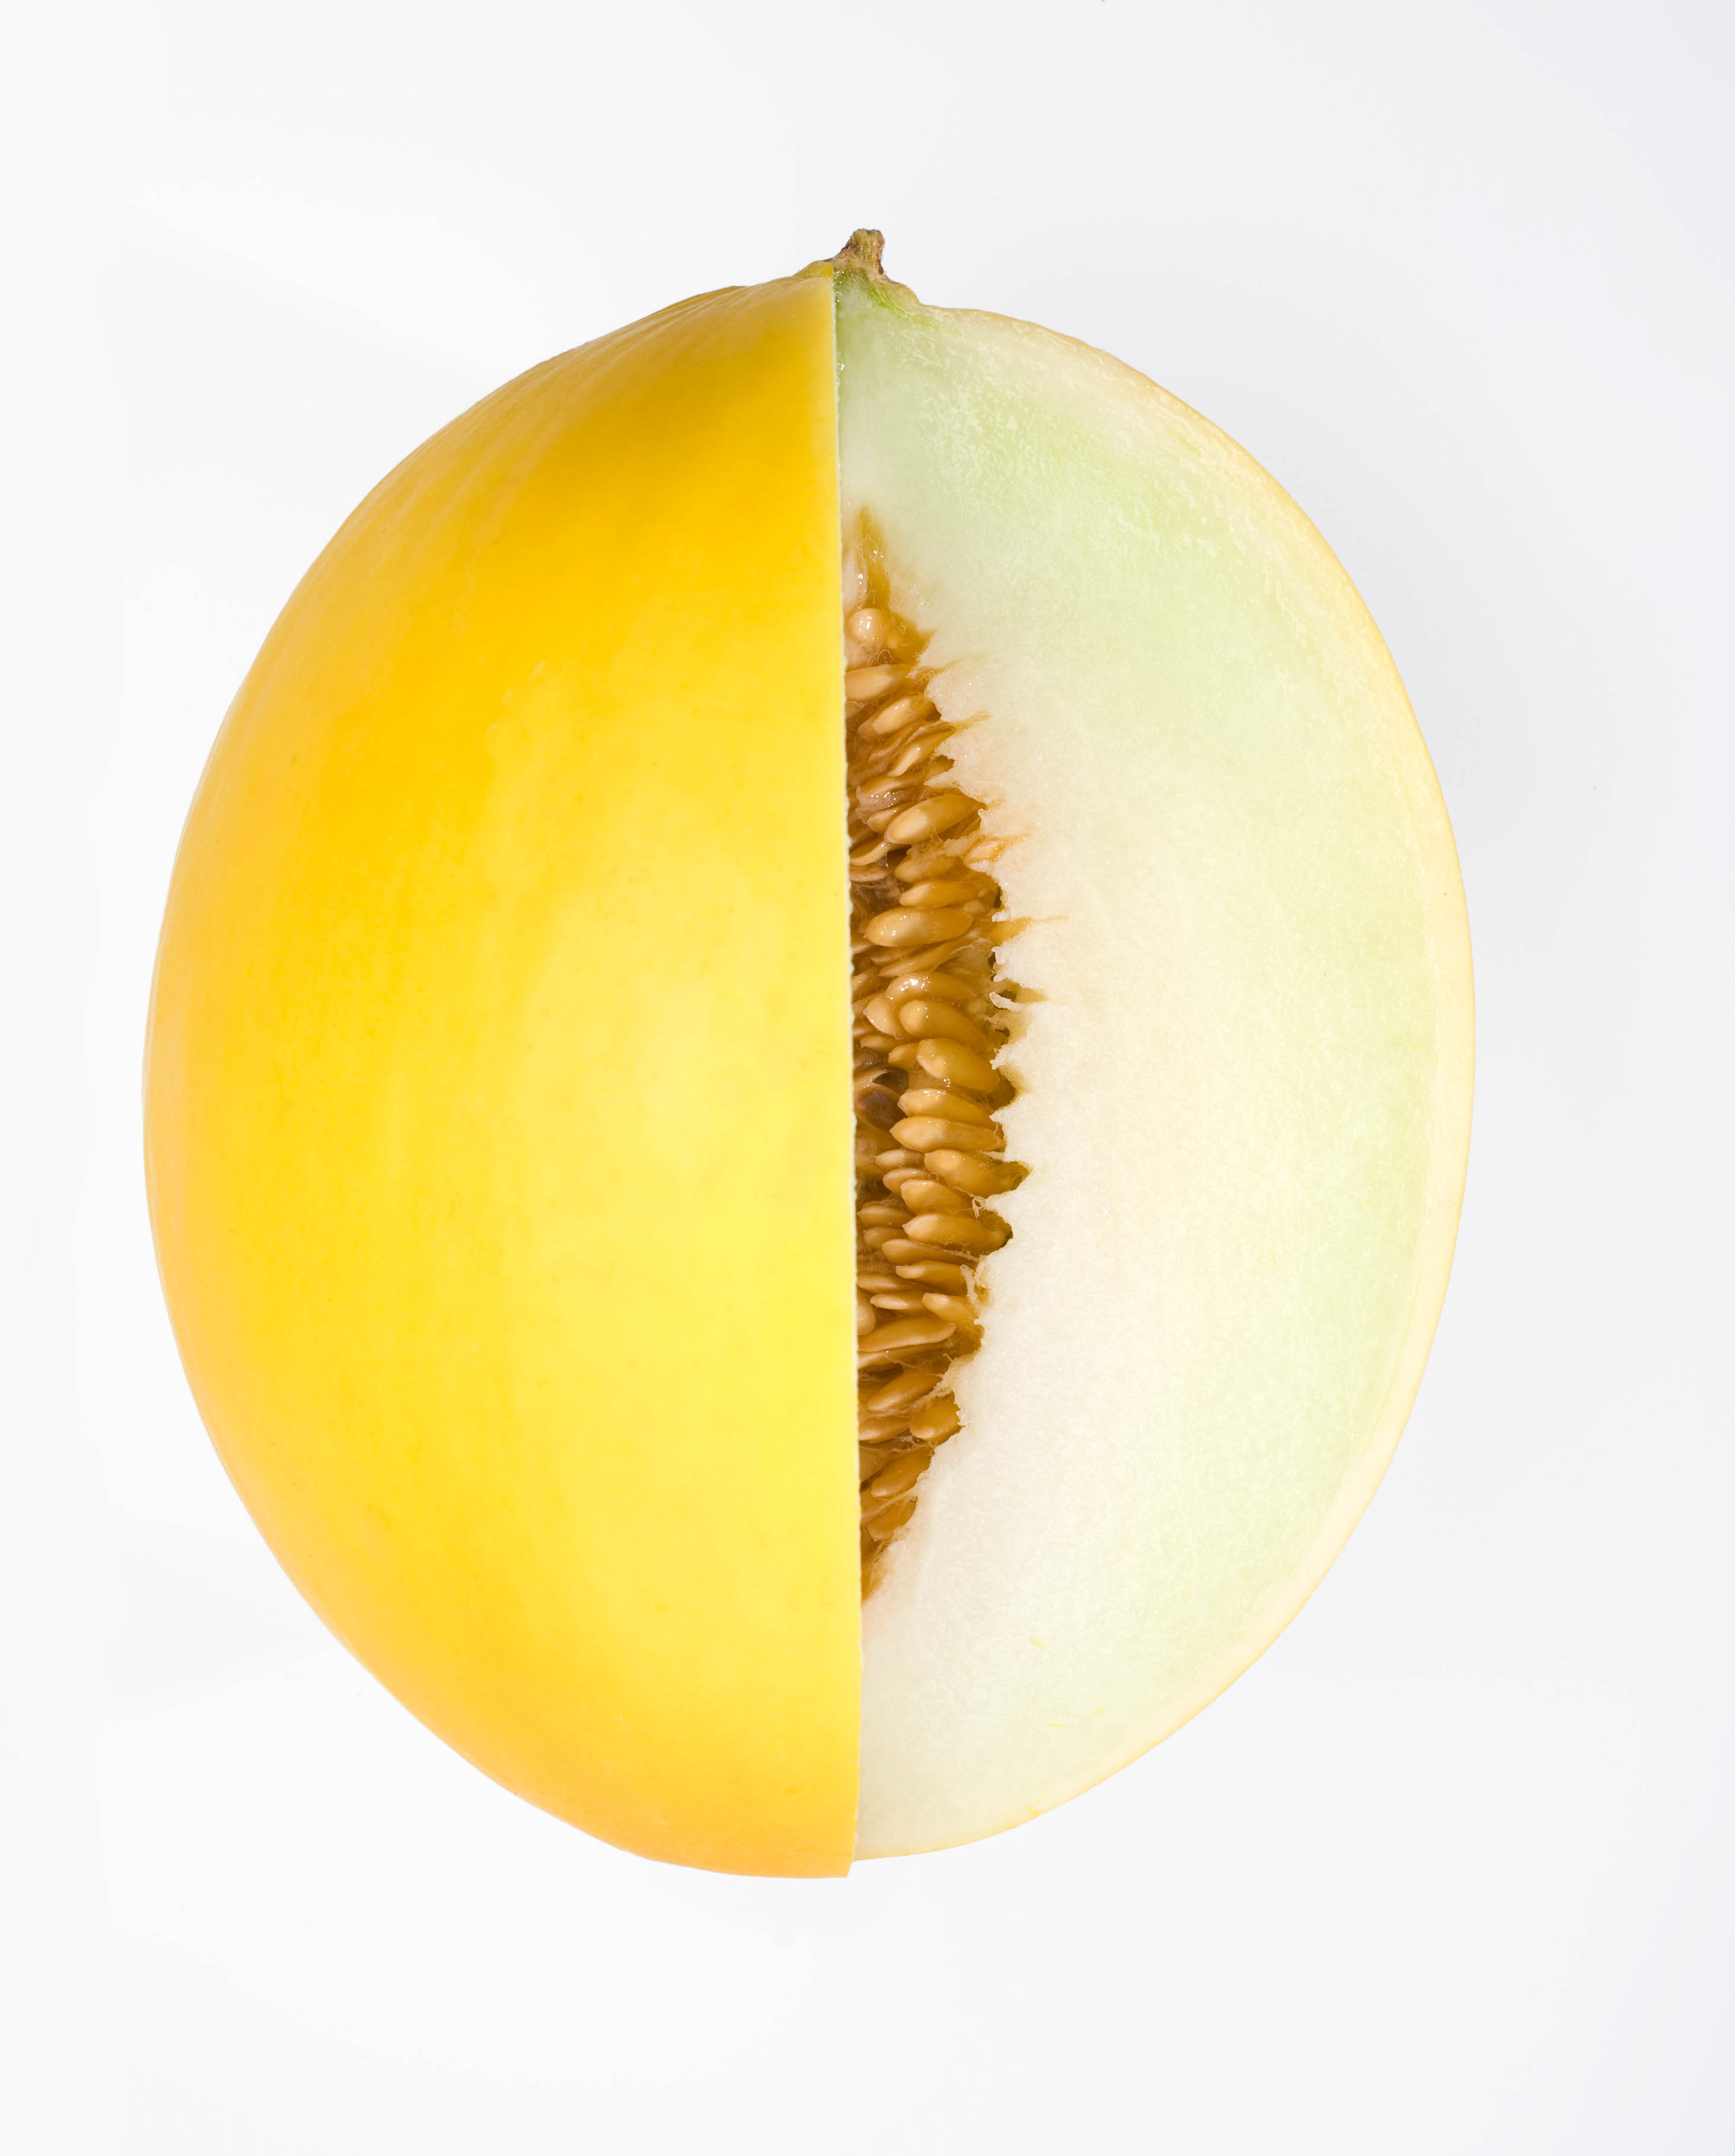 Honeydew melon hd image